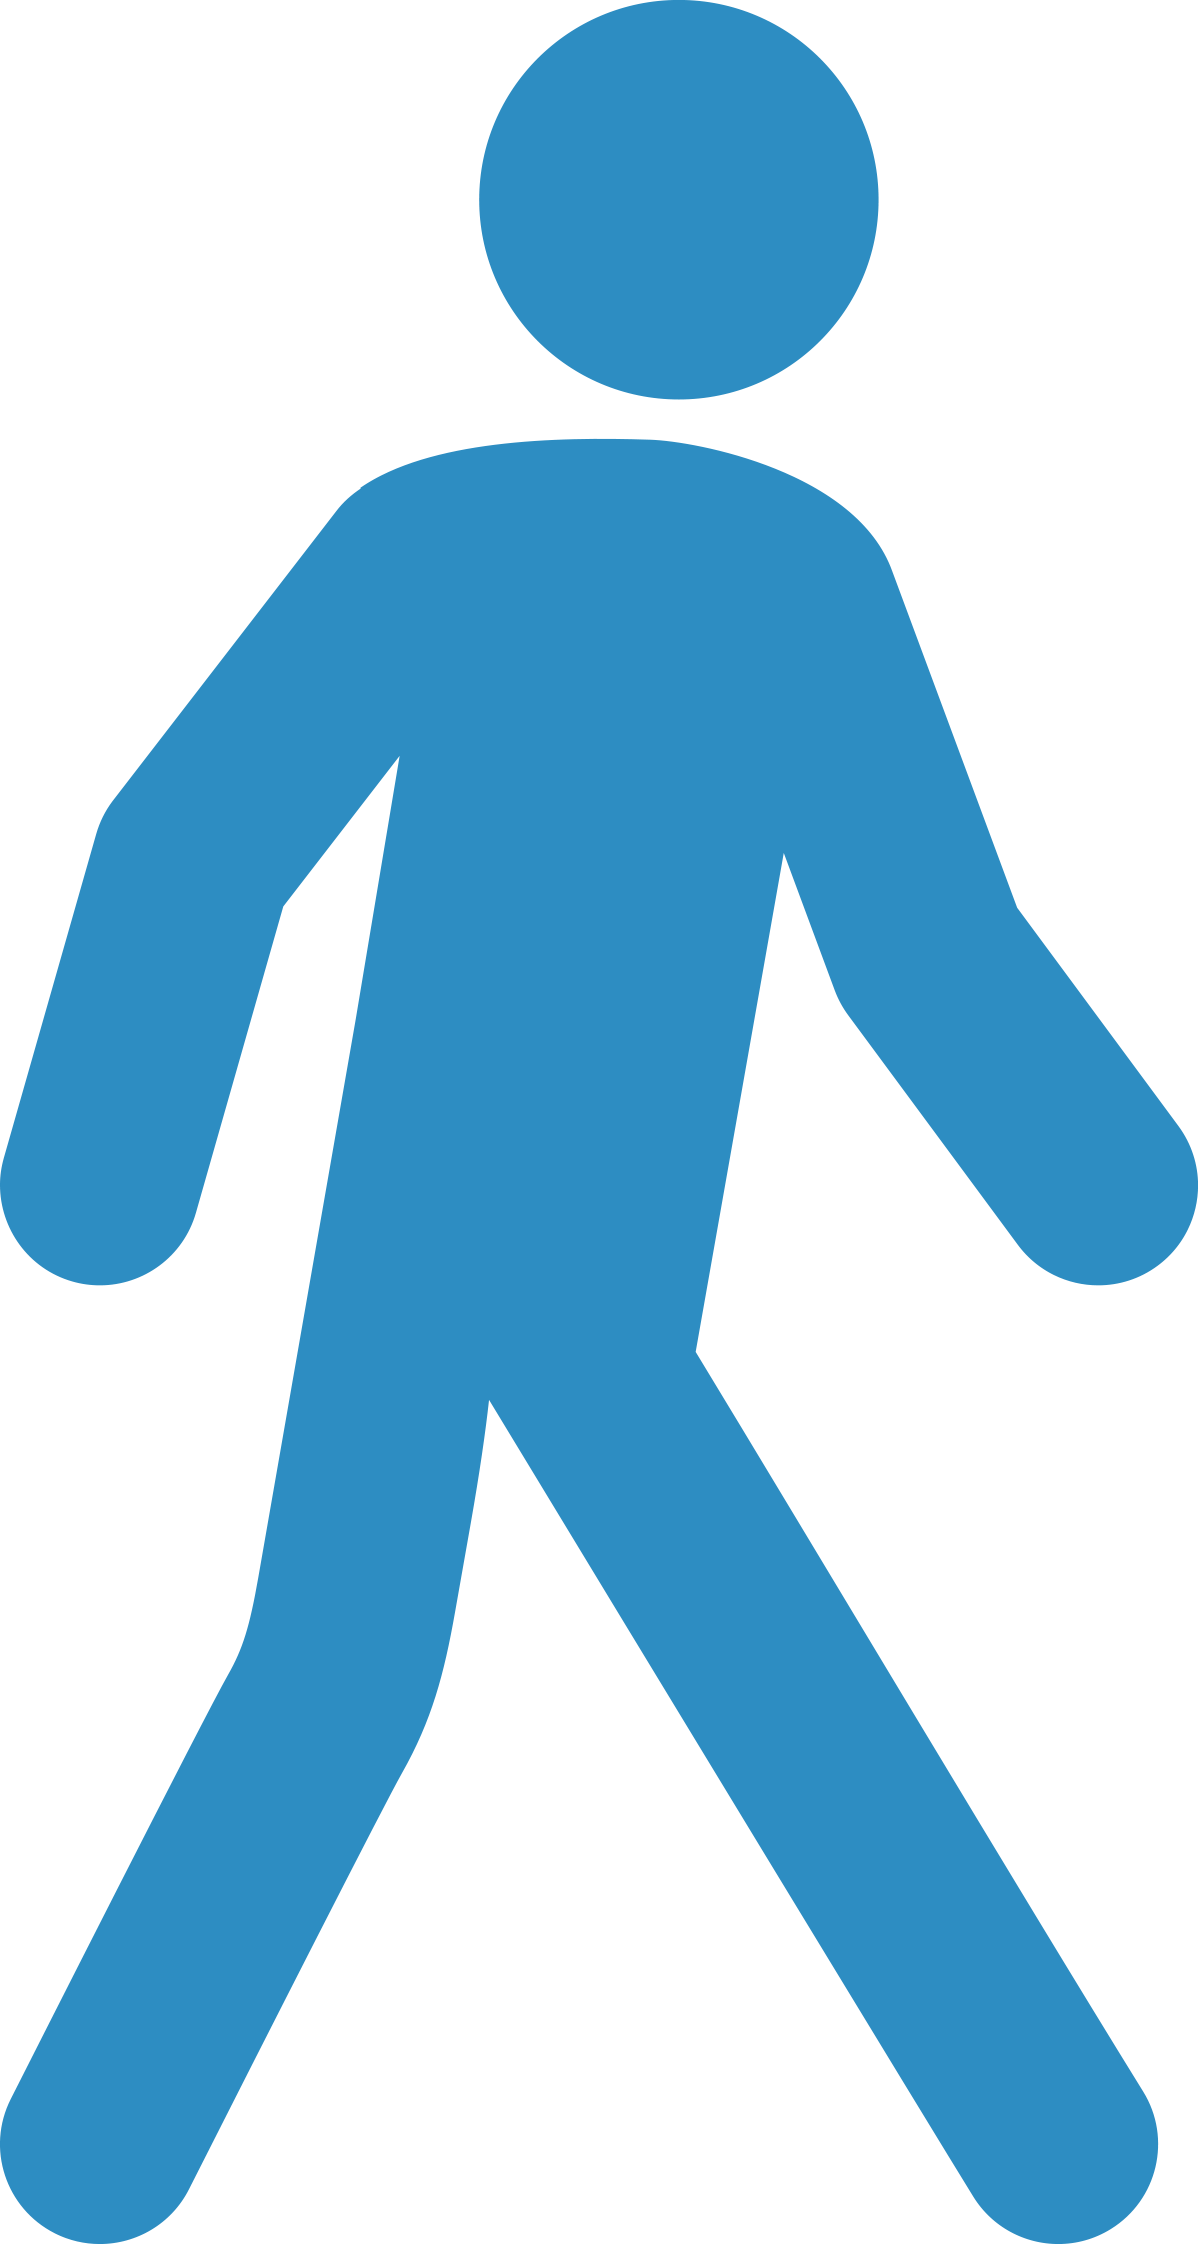 Fußverkehr